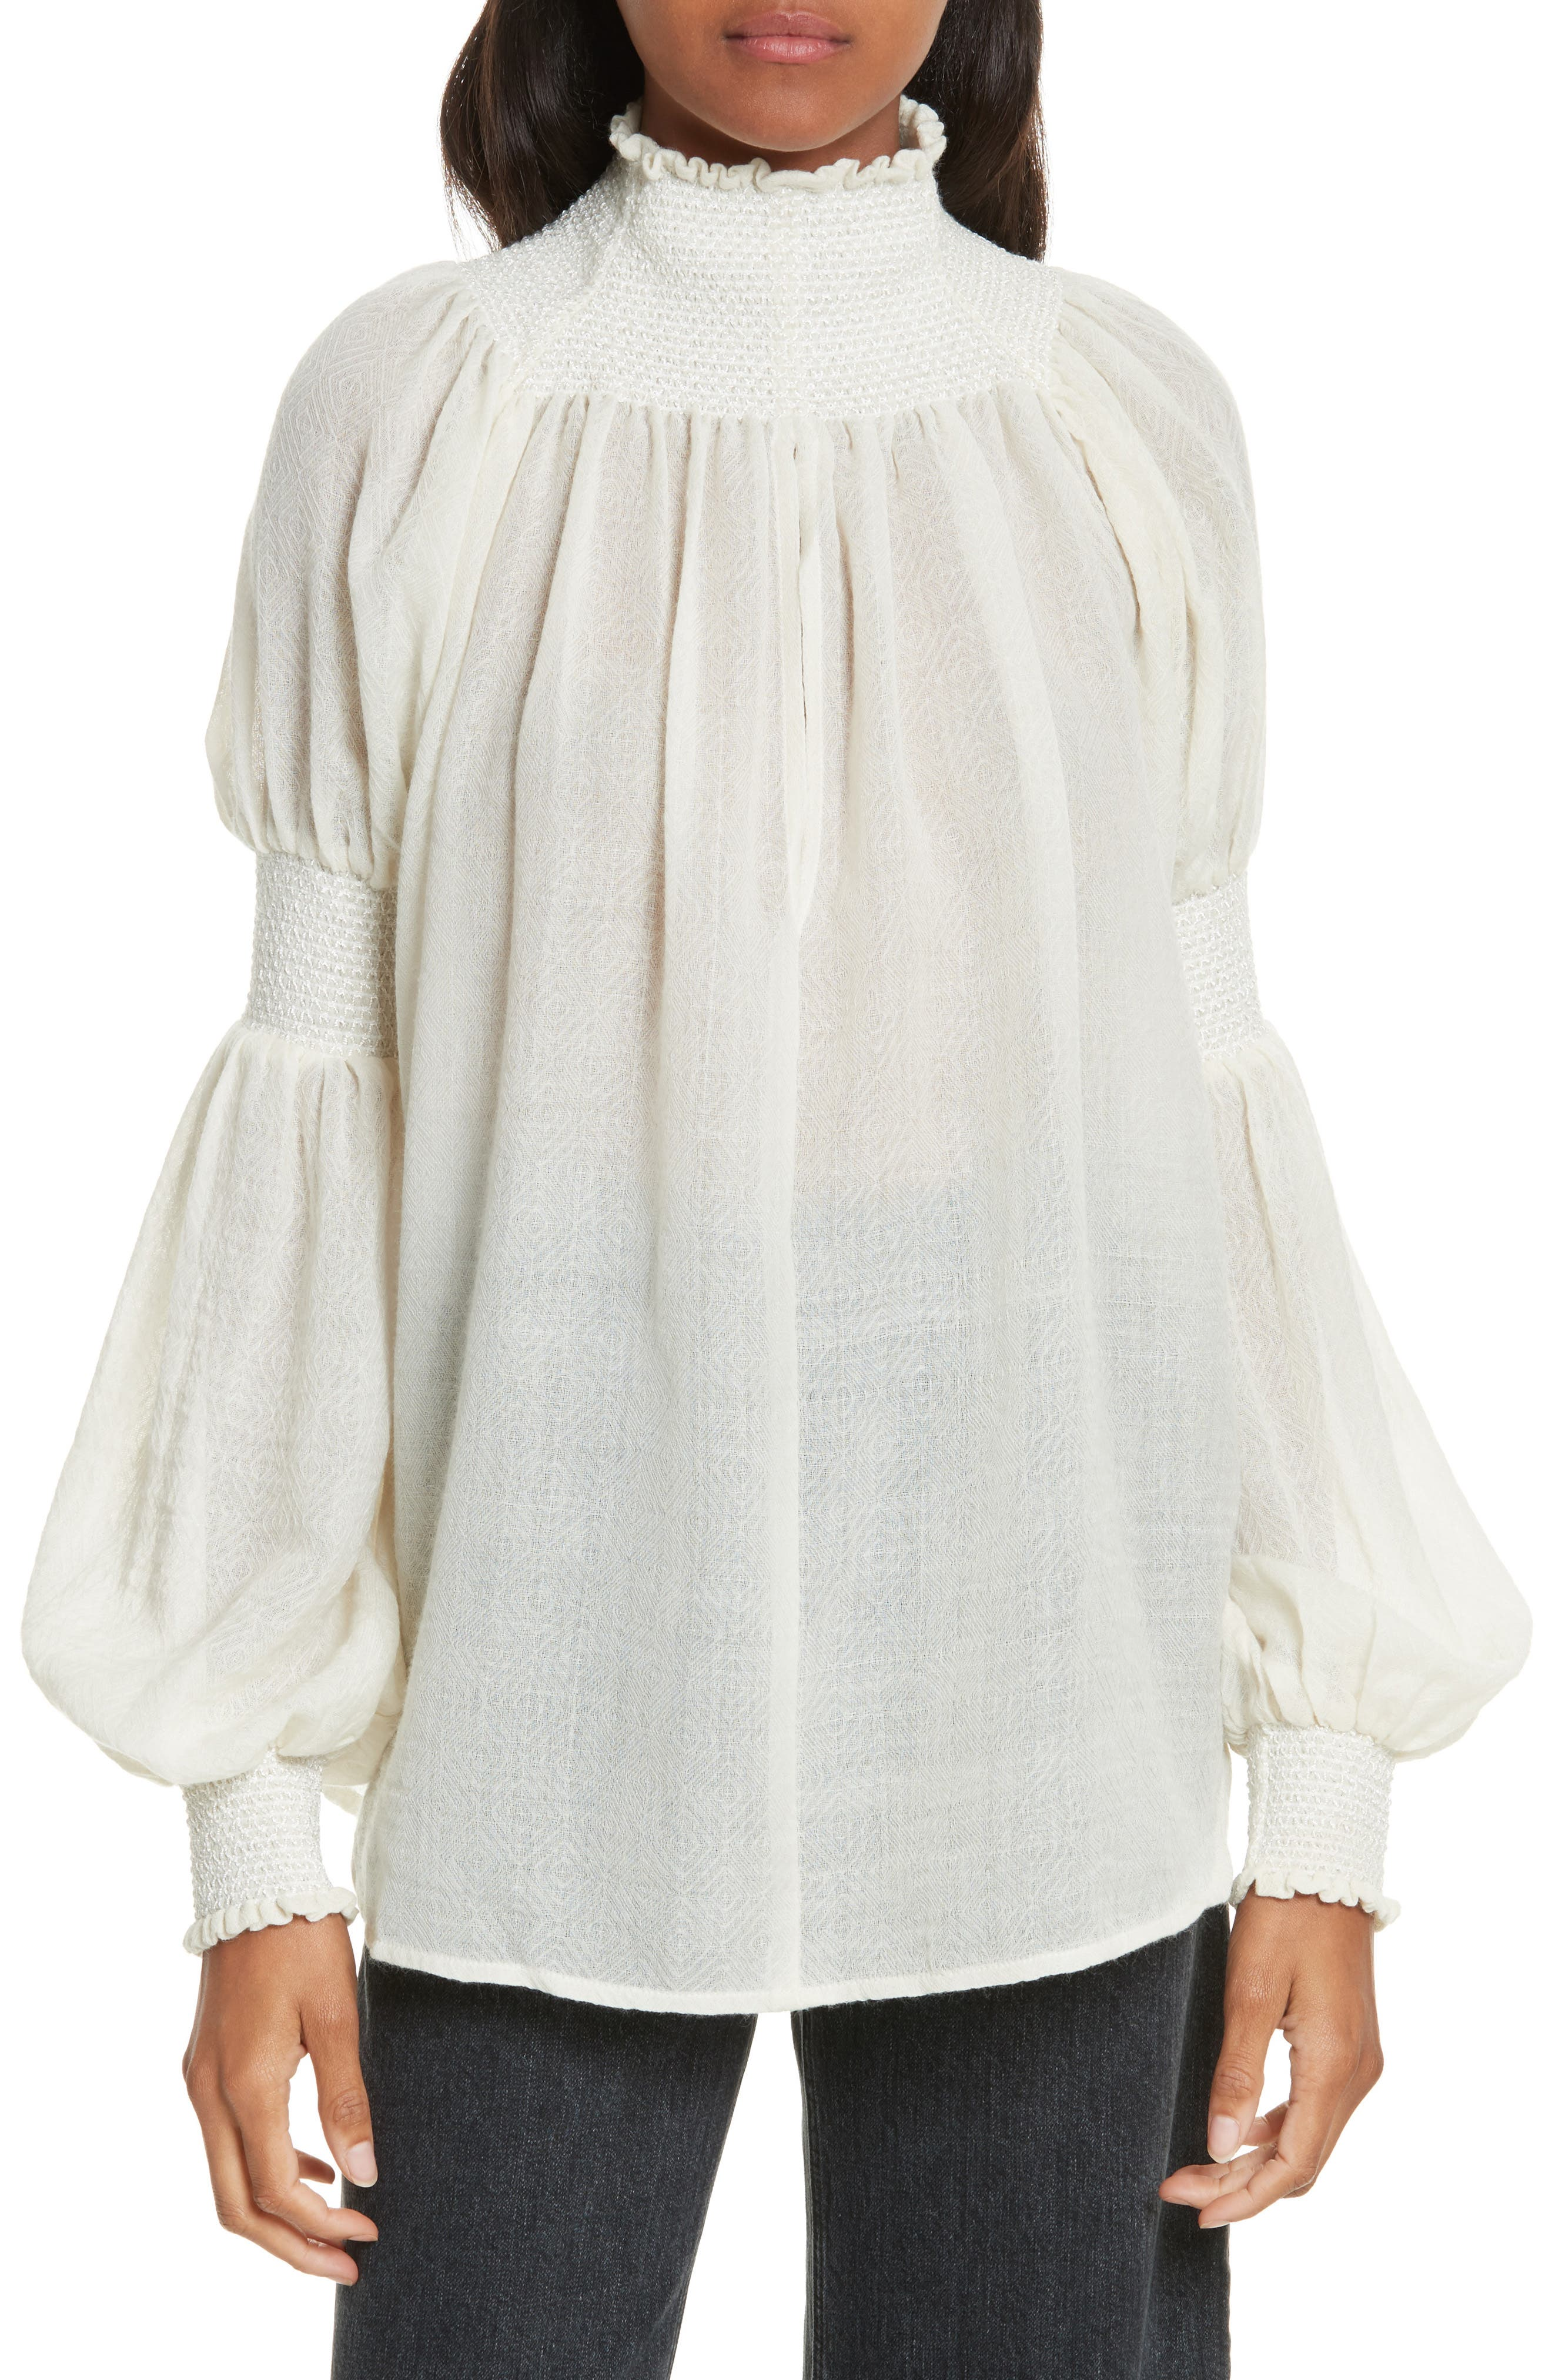 Alternate Image 1 Selected - Rachel Comey Renew Wool Top